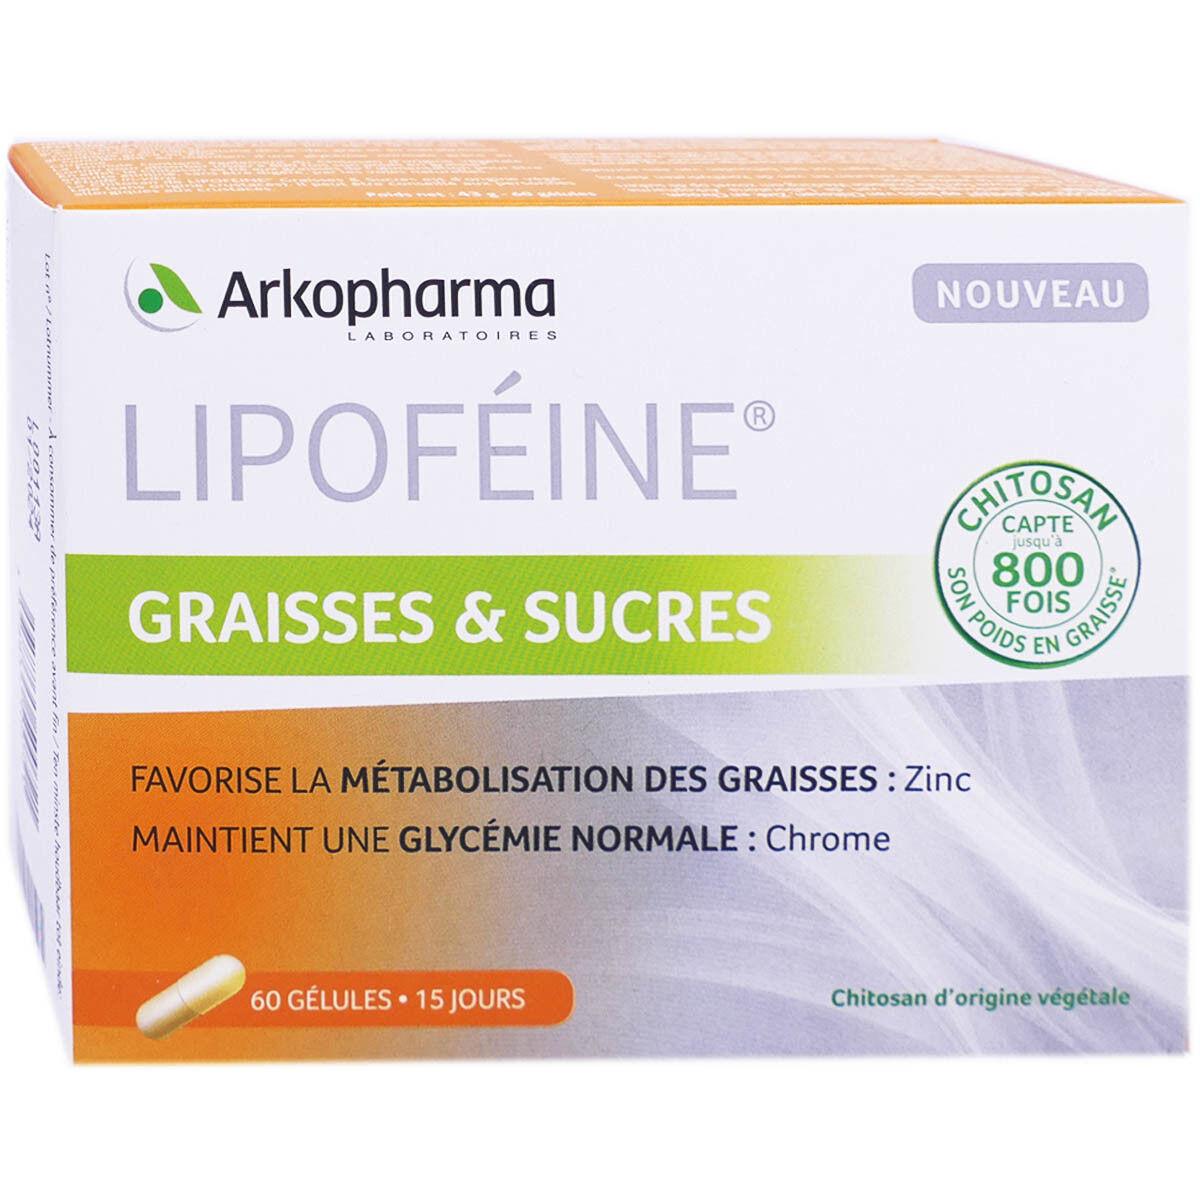 ARKOPHARMA Akopharma lipofeine graisses & sucres 60 capsules